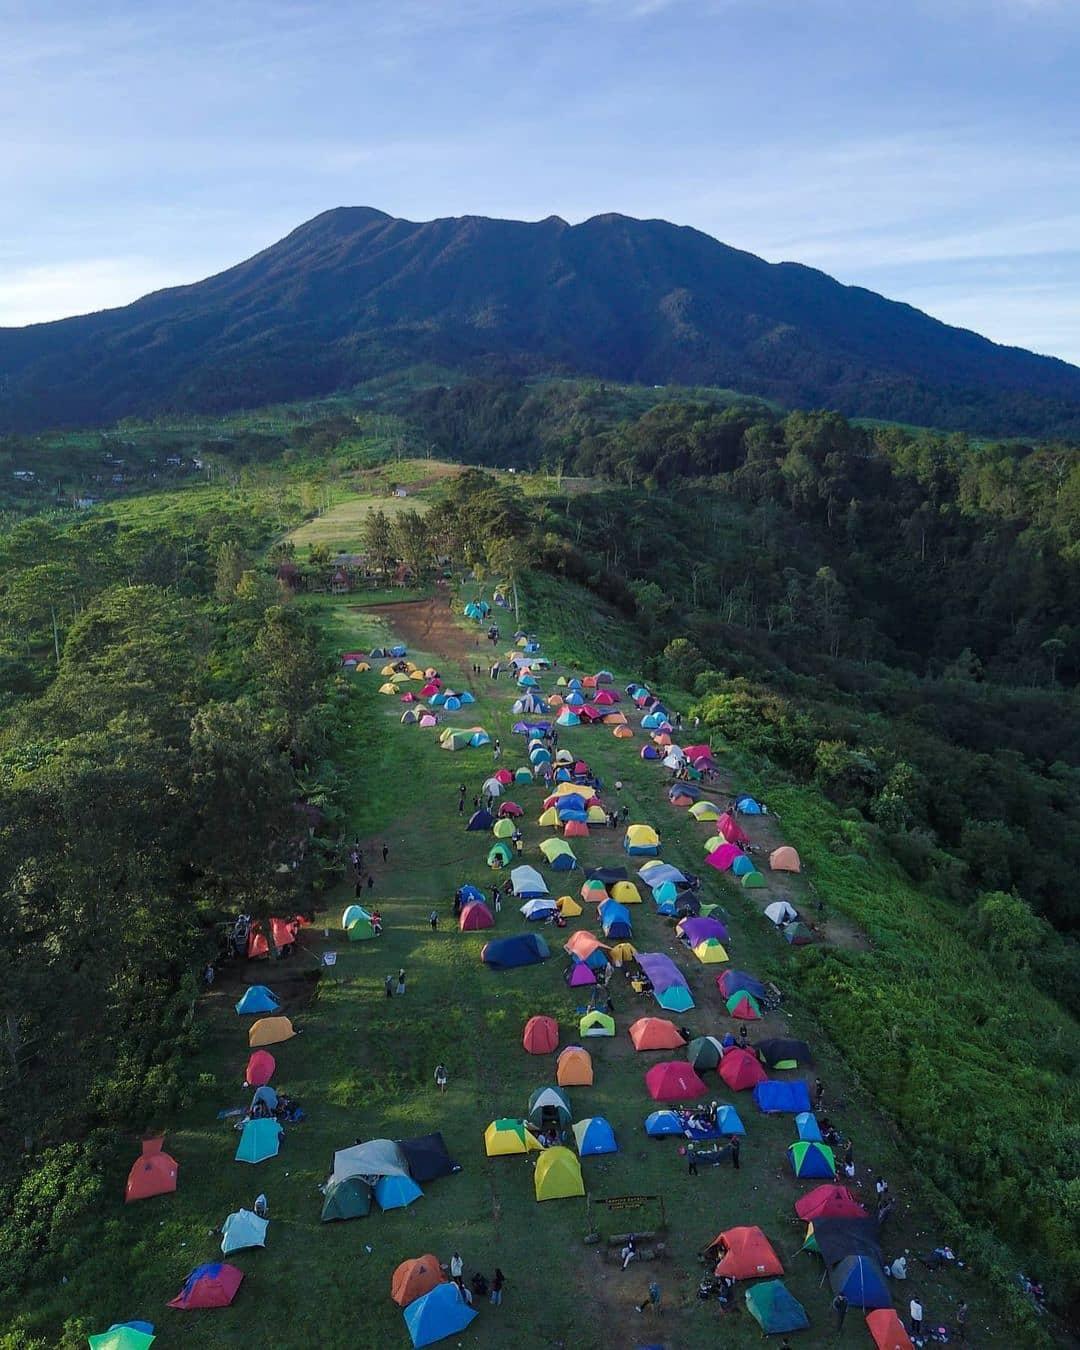 gayatri camp ground